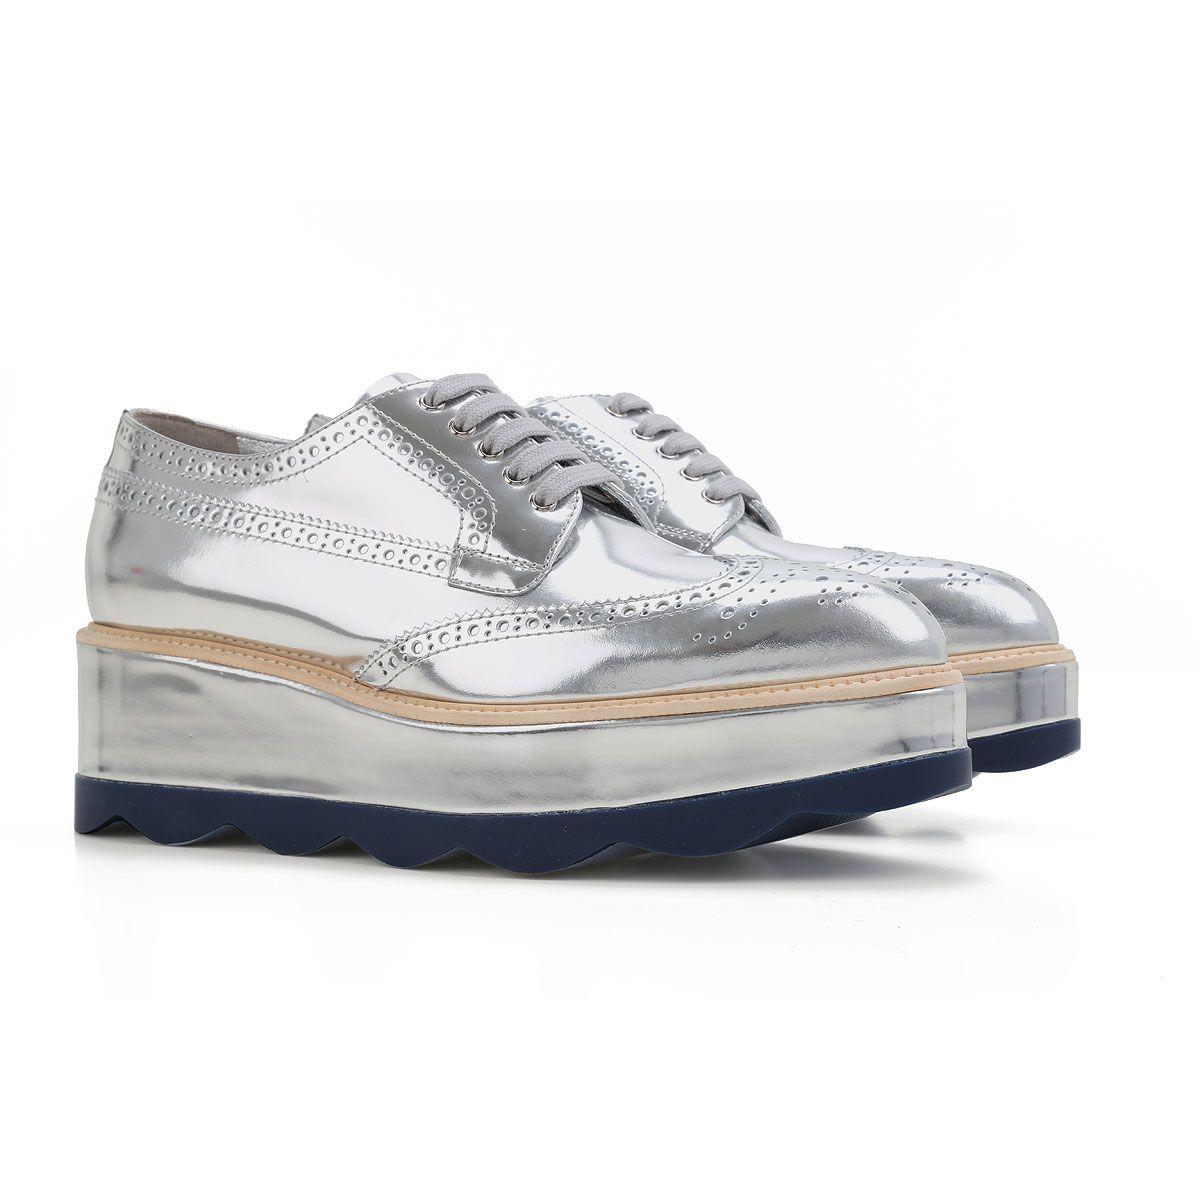 Chaussures Prada Femme. Vente chaussures de sport et de ville Prada femme.  Printemps- ad901f4d82df